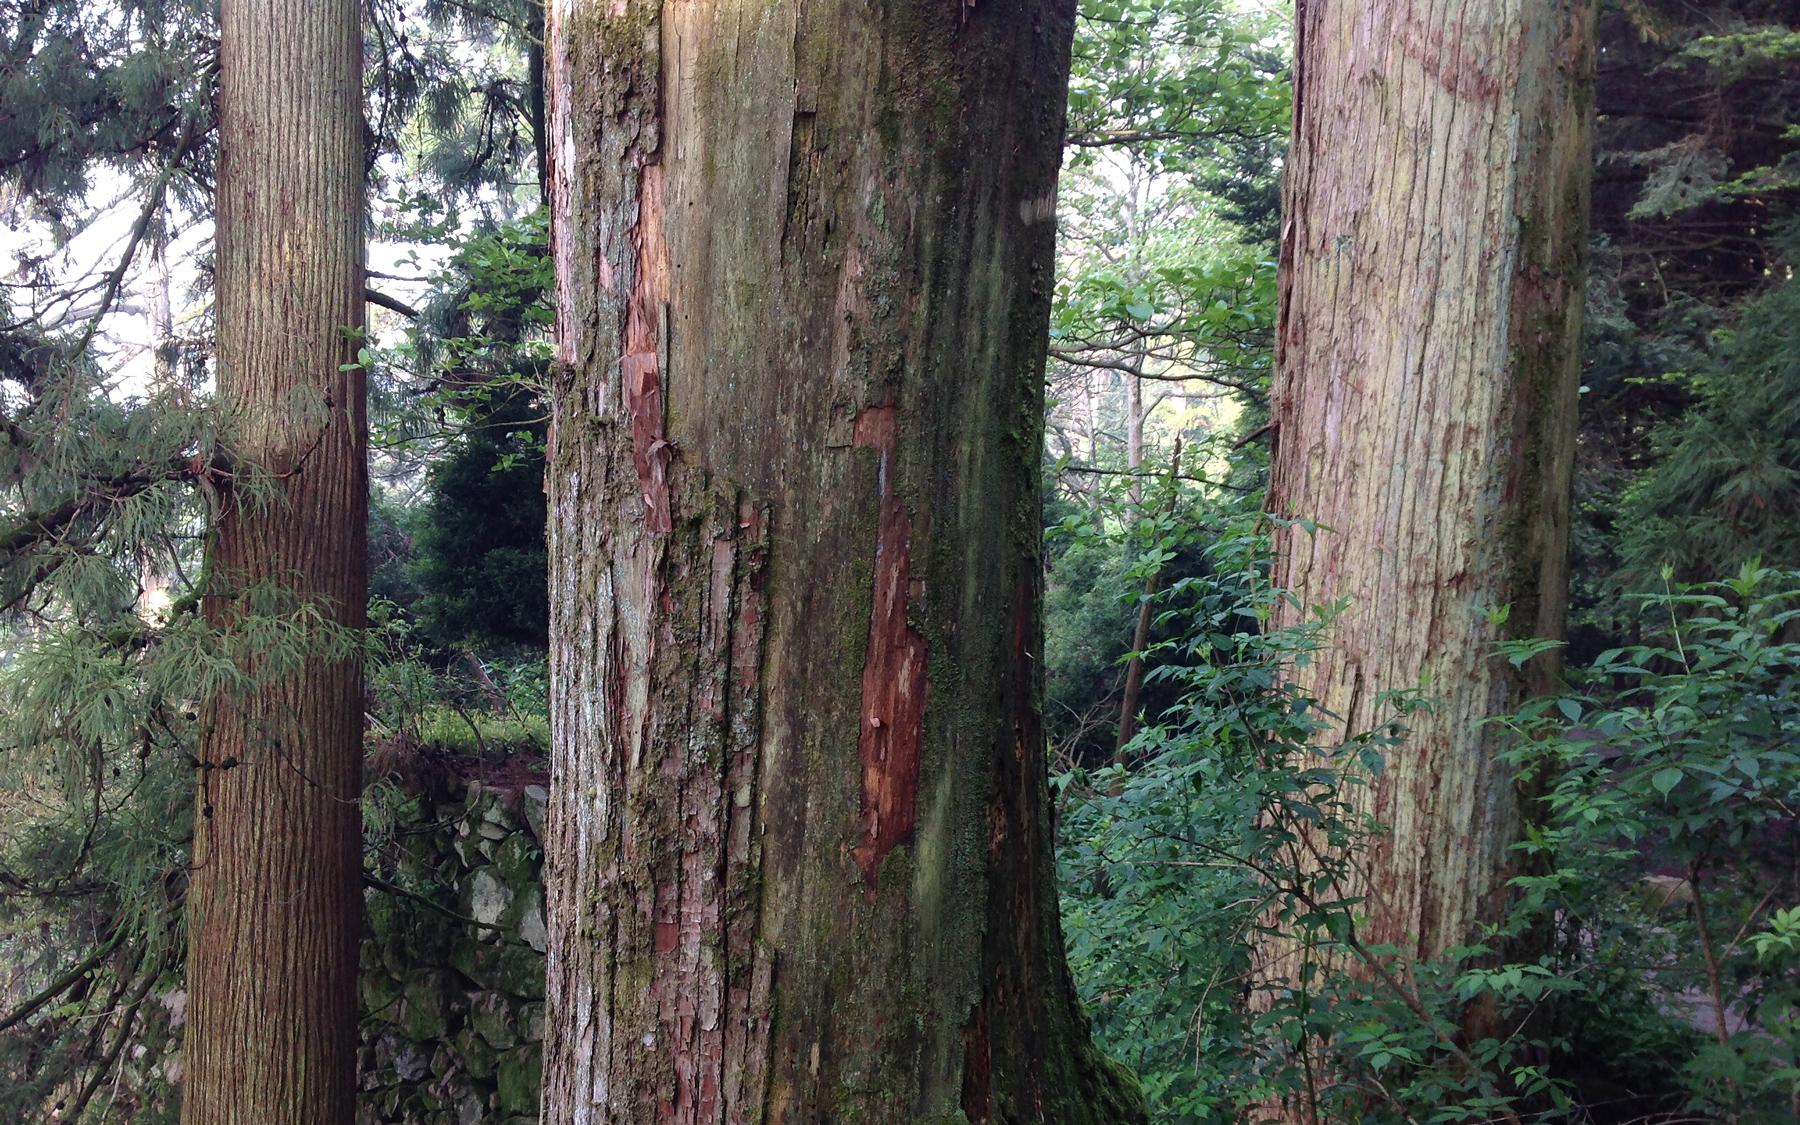 Japanese Cedar Cryptomeria japonica